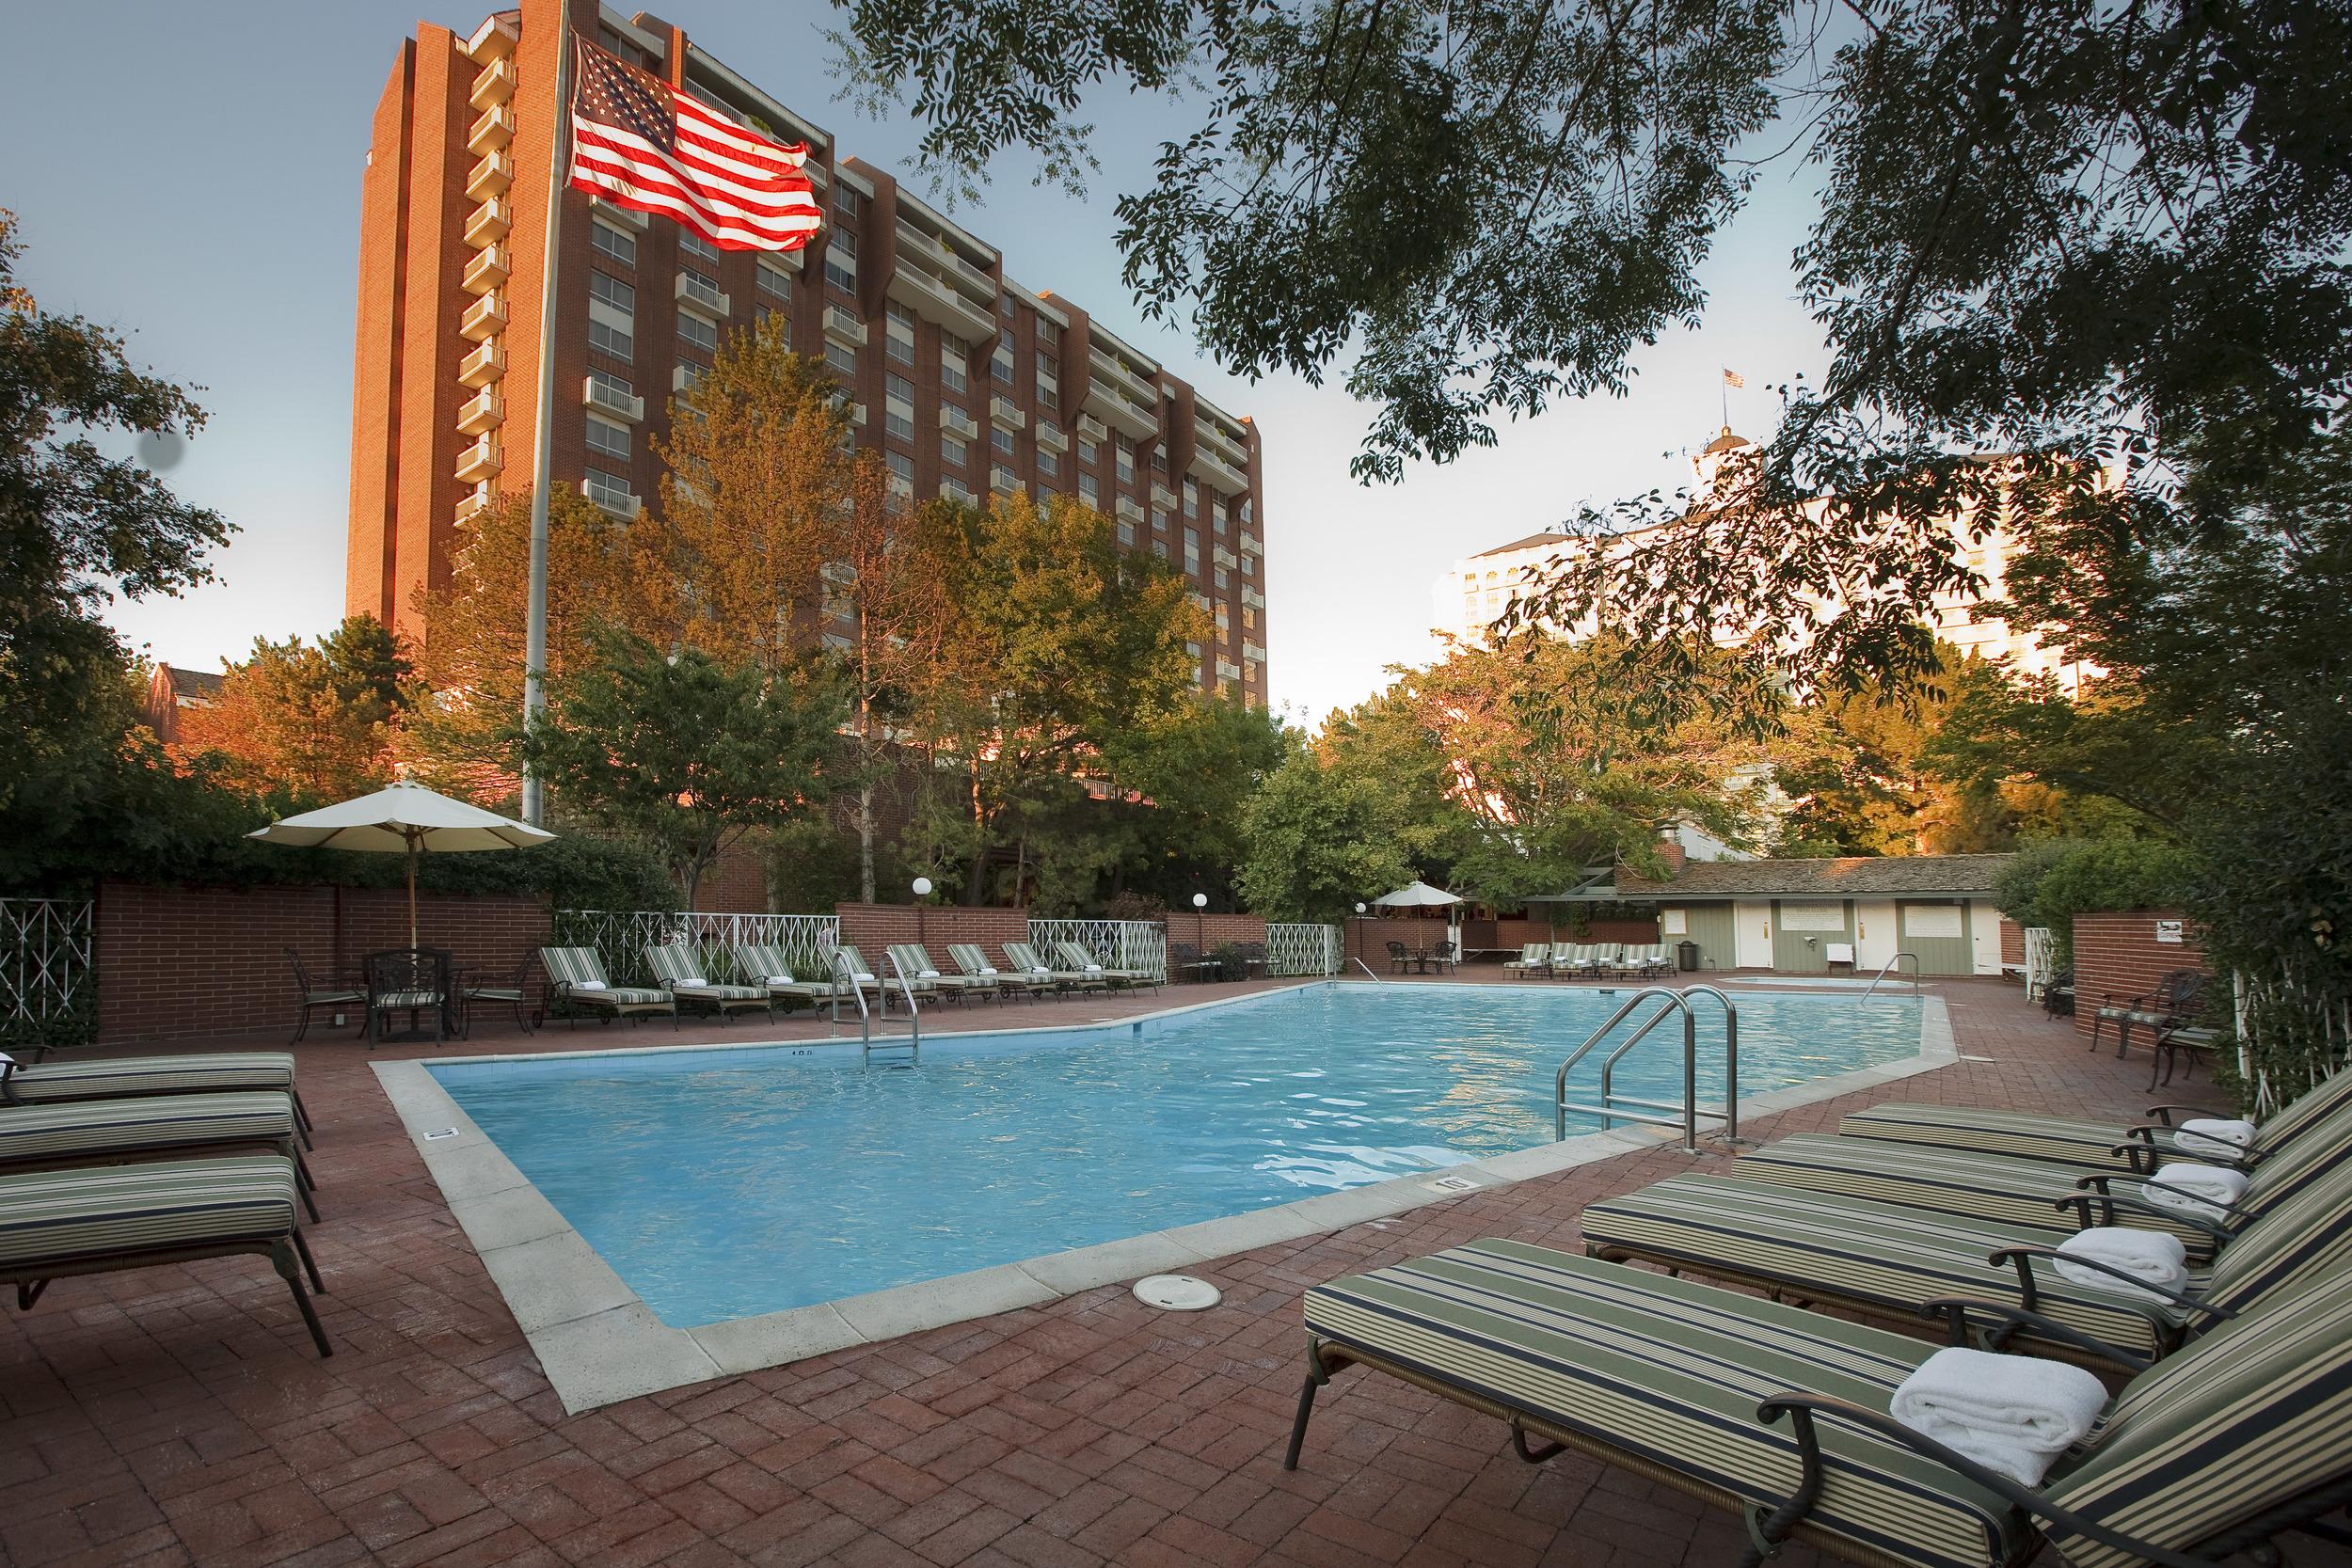 3/The Little America Hotel